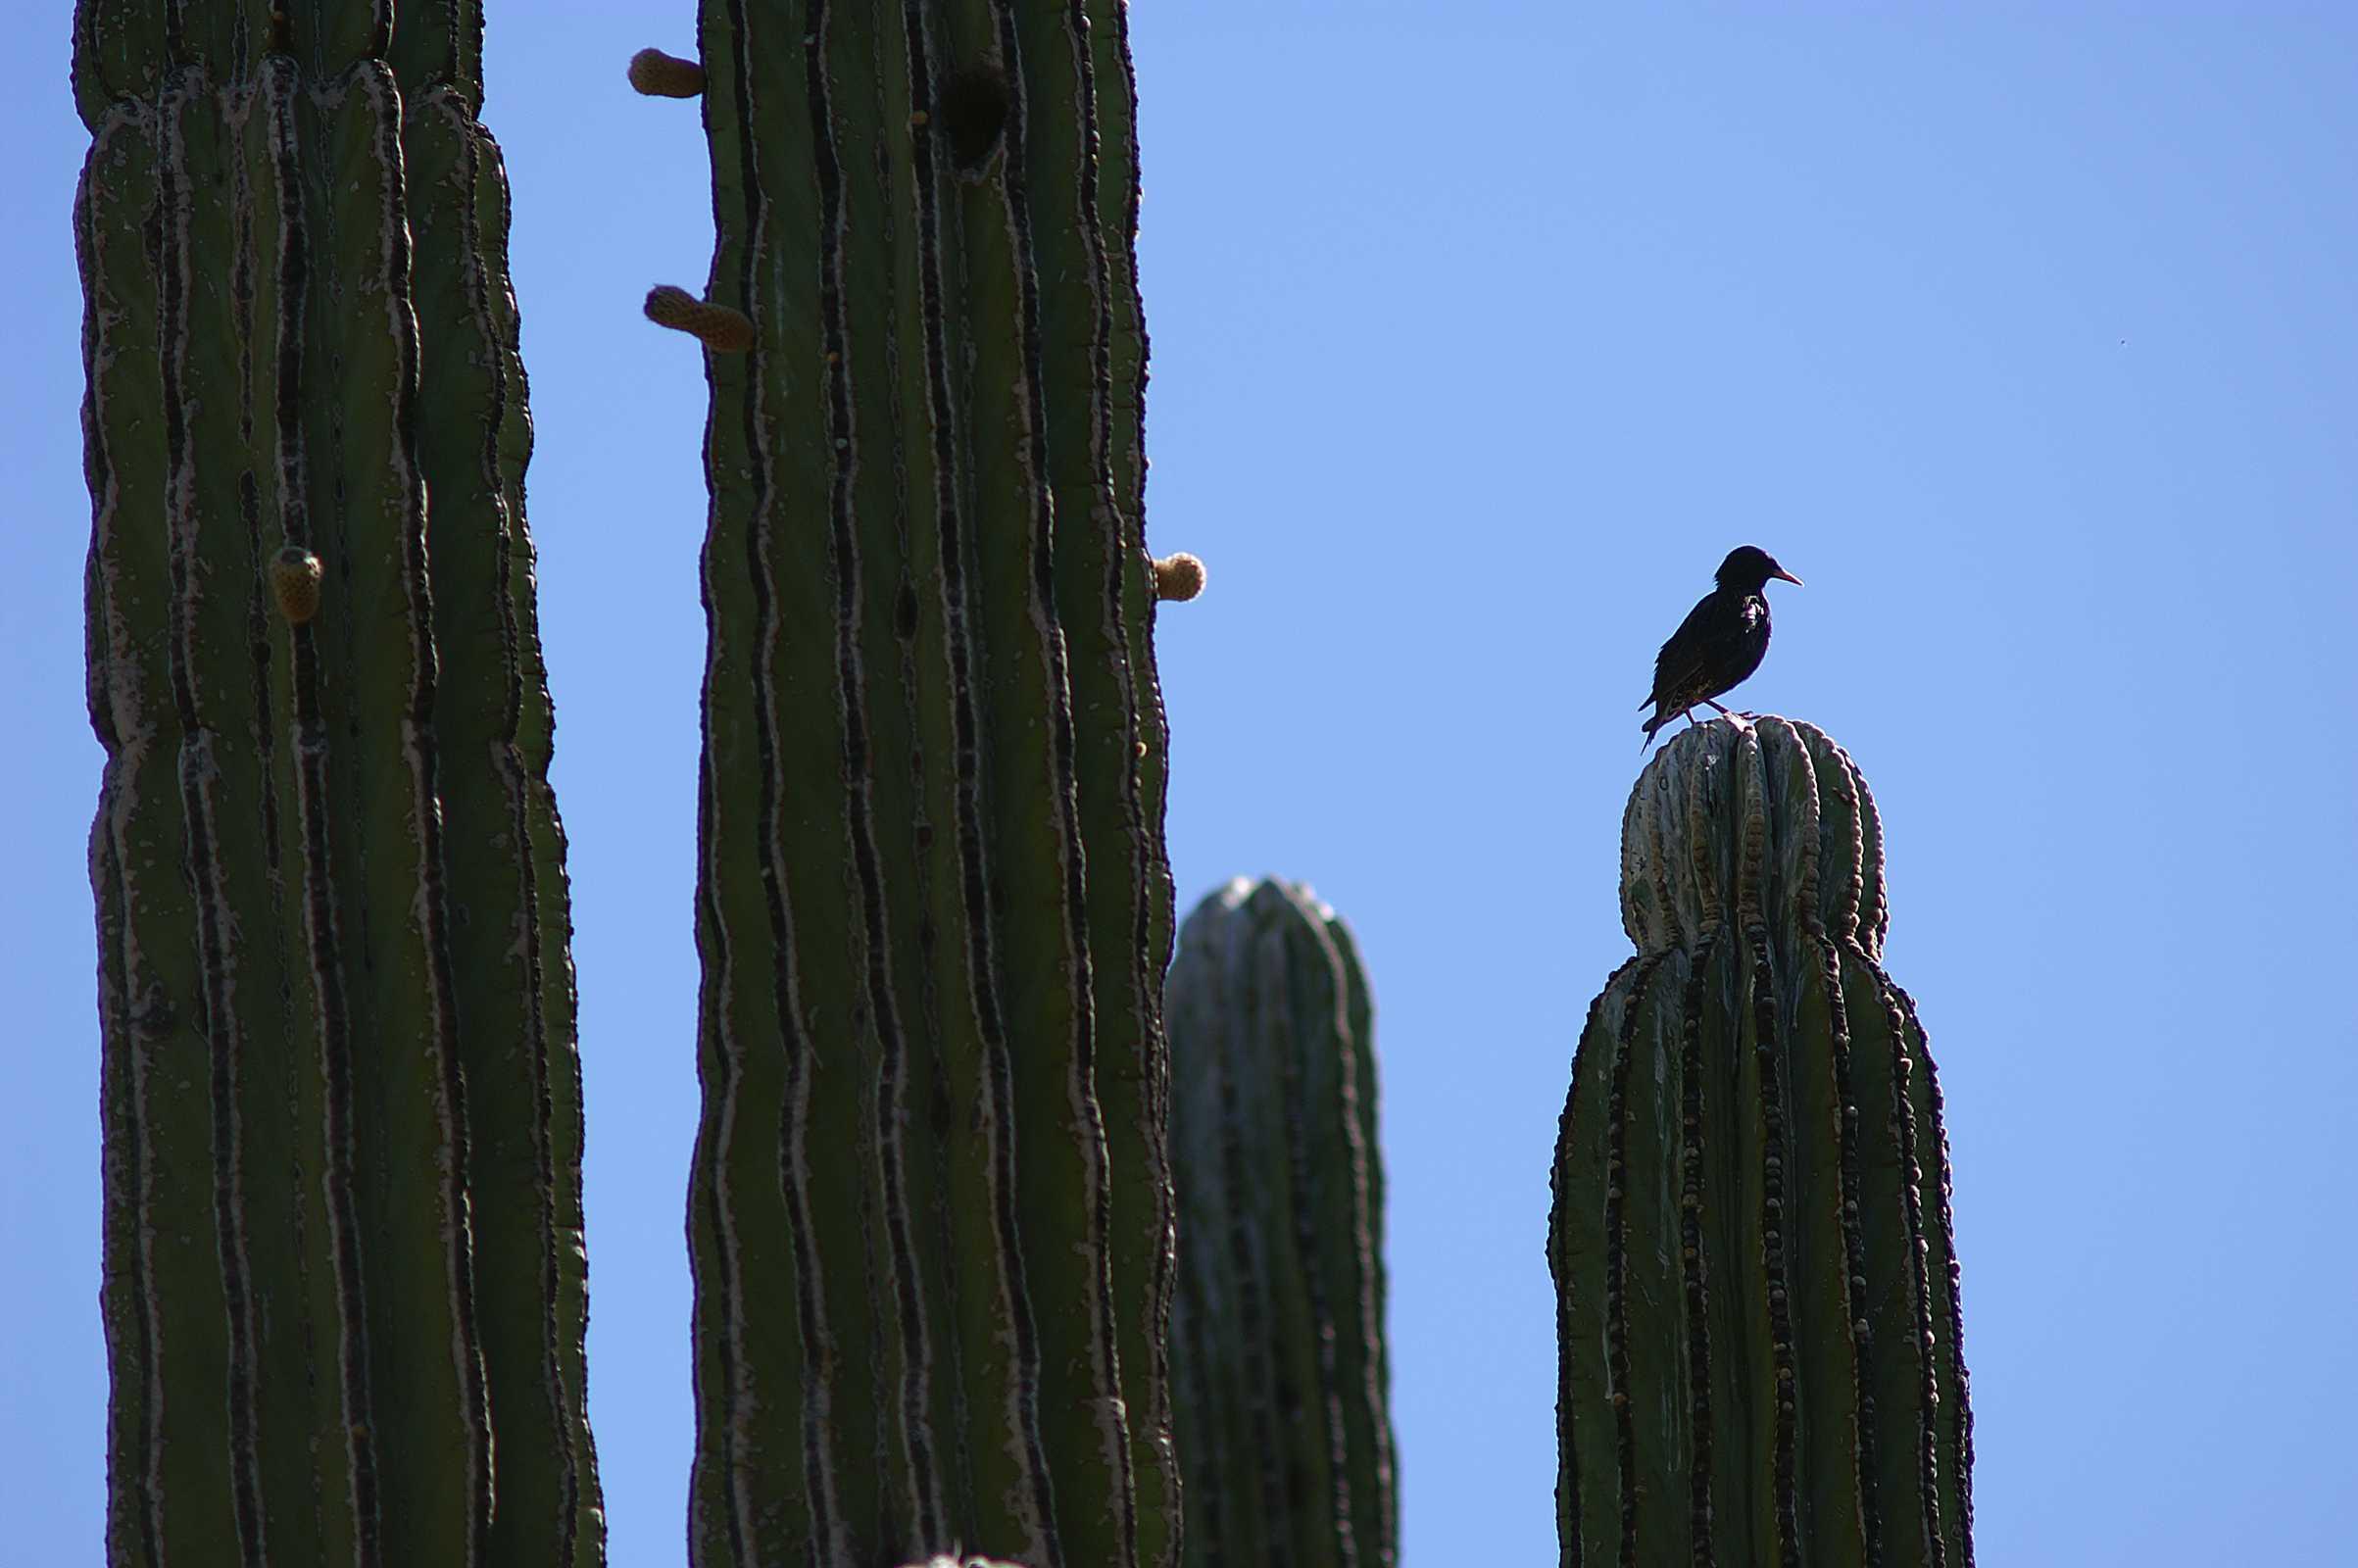 Bird sitting on cactus, Animal, Bird, Cactus, Columns, HQ Photo